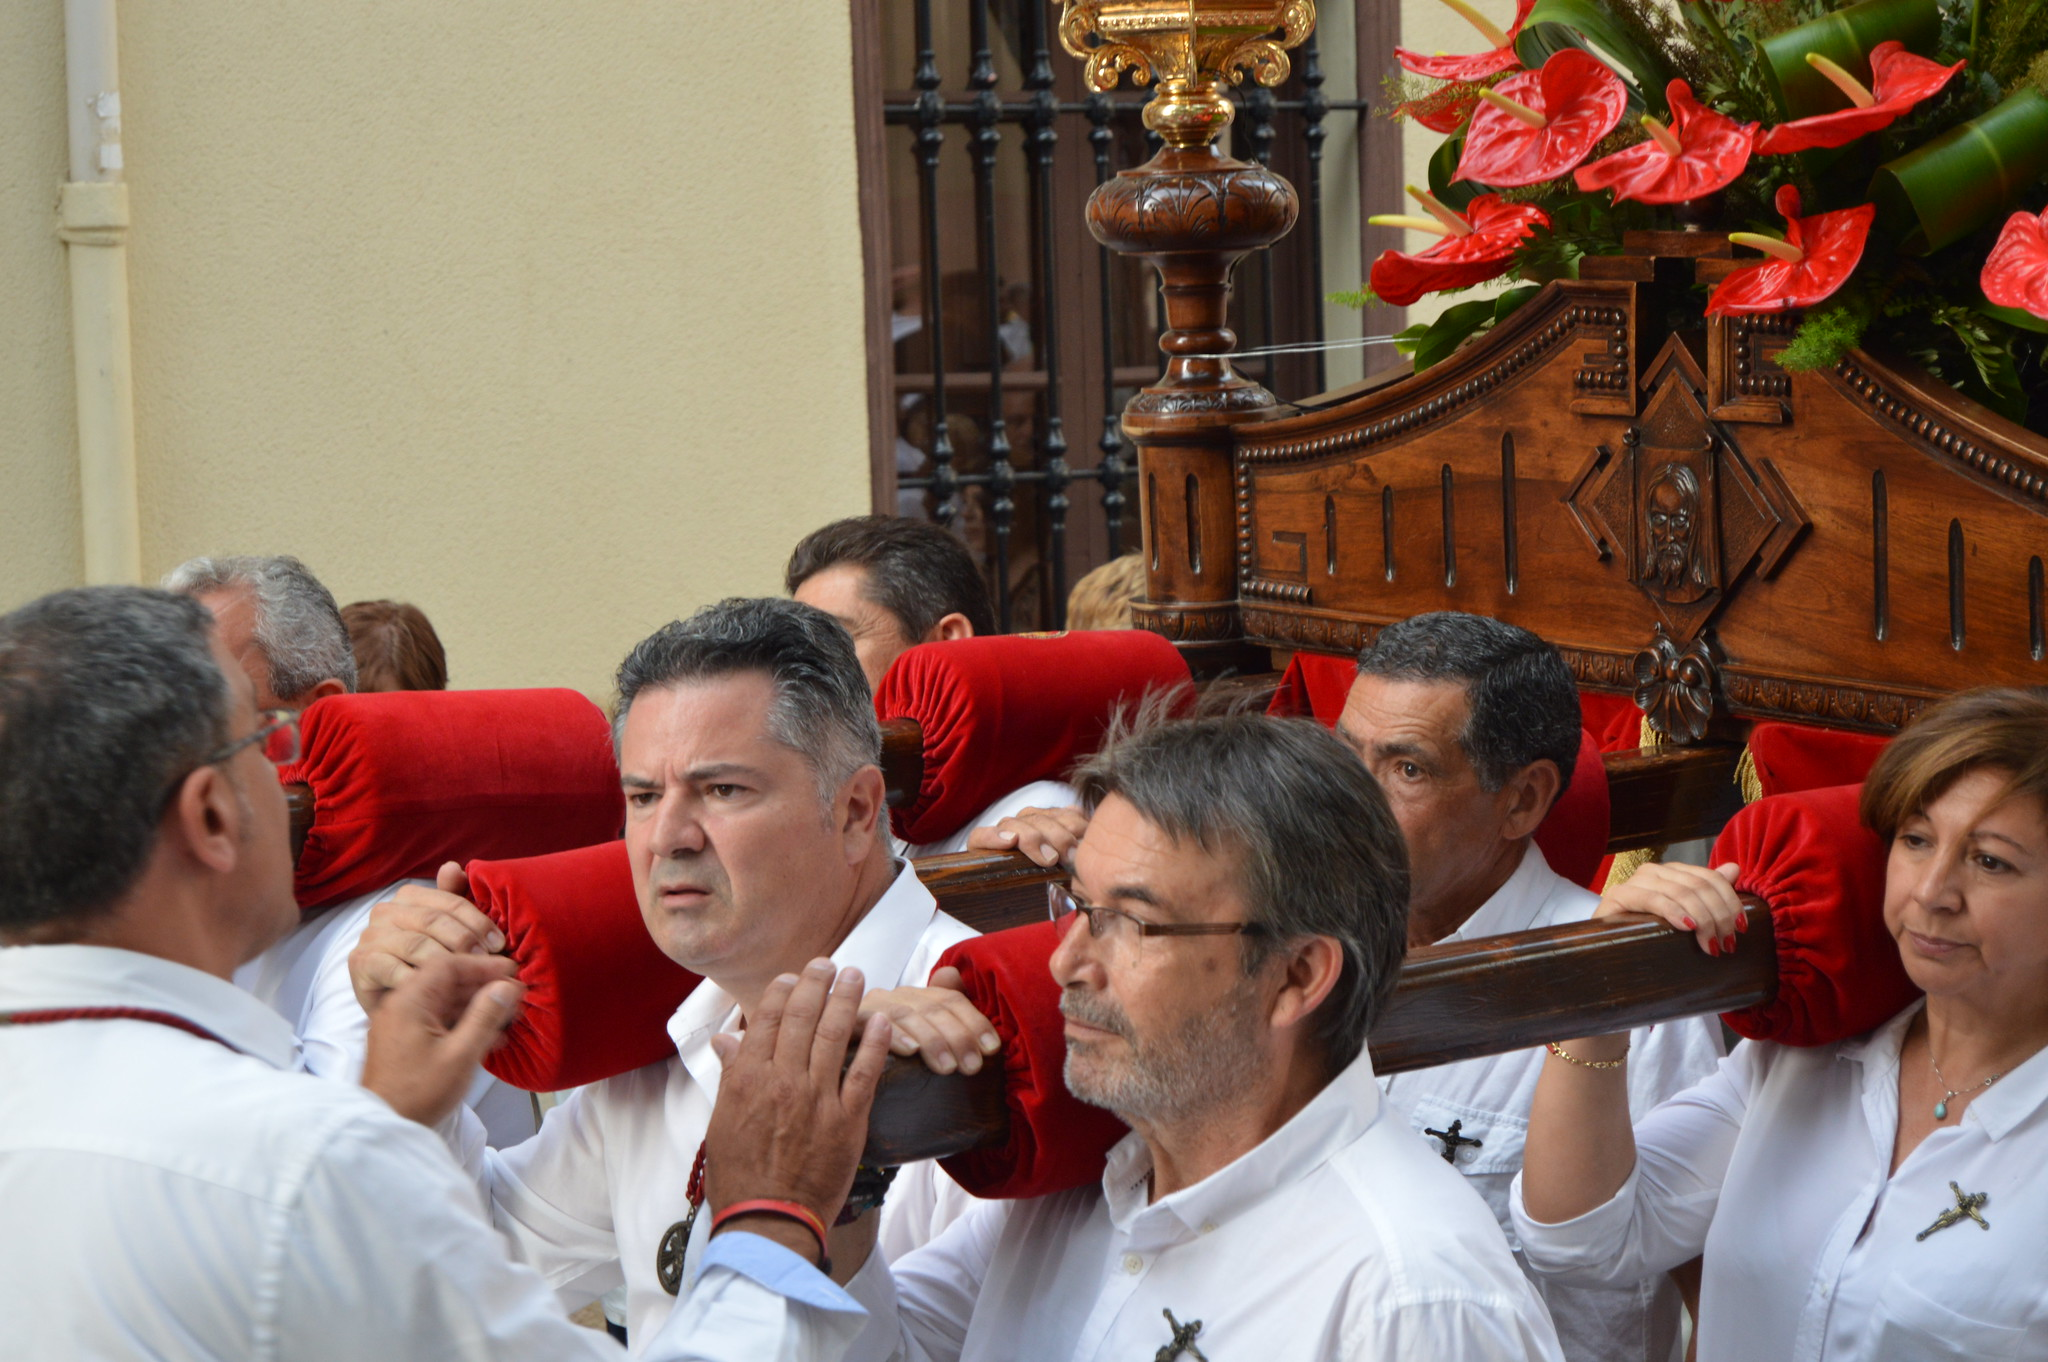 (2019-07-07) Procesión de subida - Adrián Romero Montesinos (04)